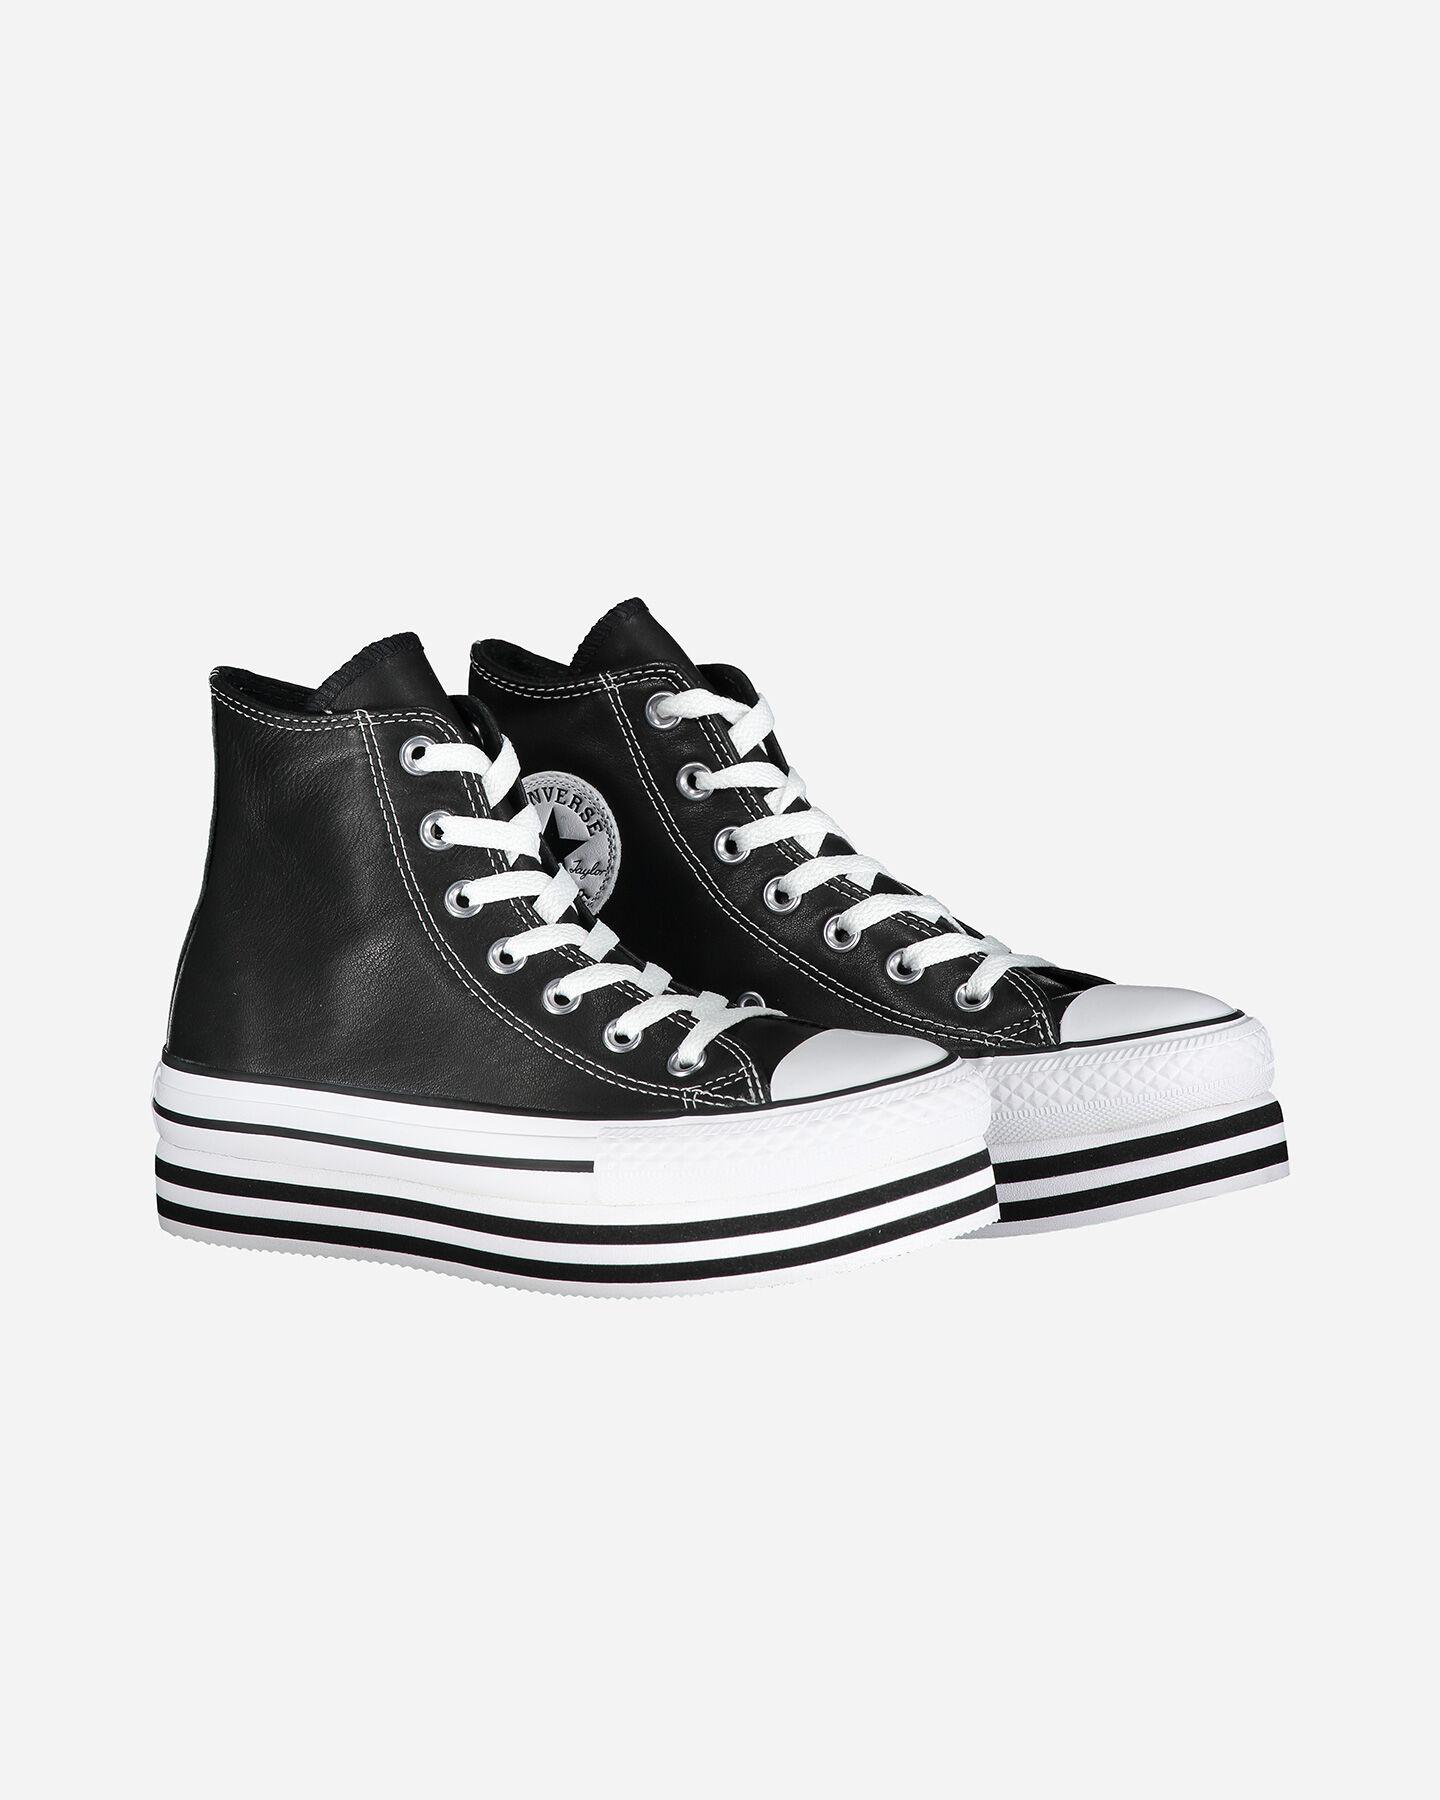 scarpe donna converse all star platform